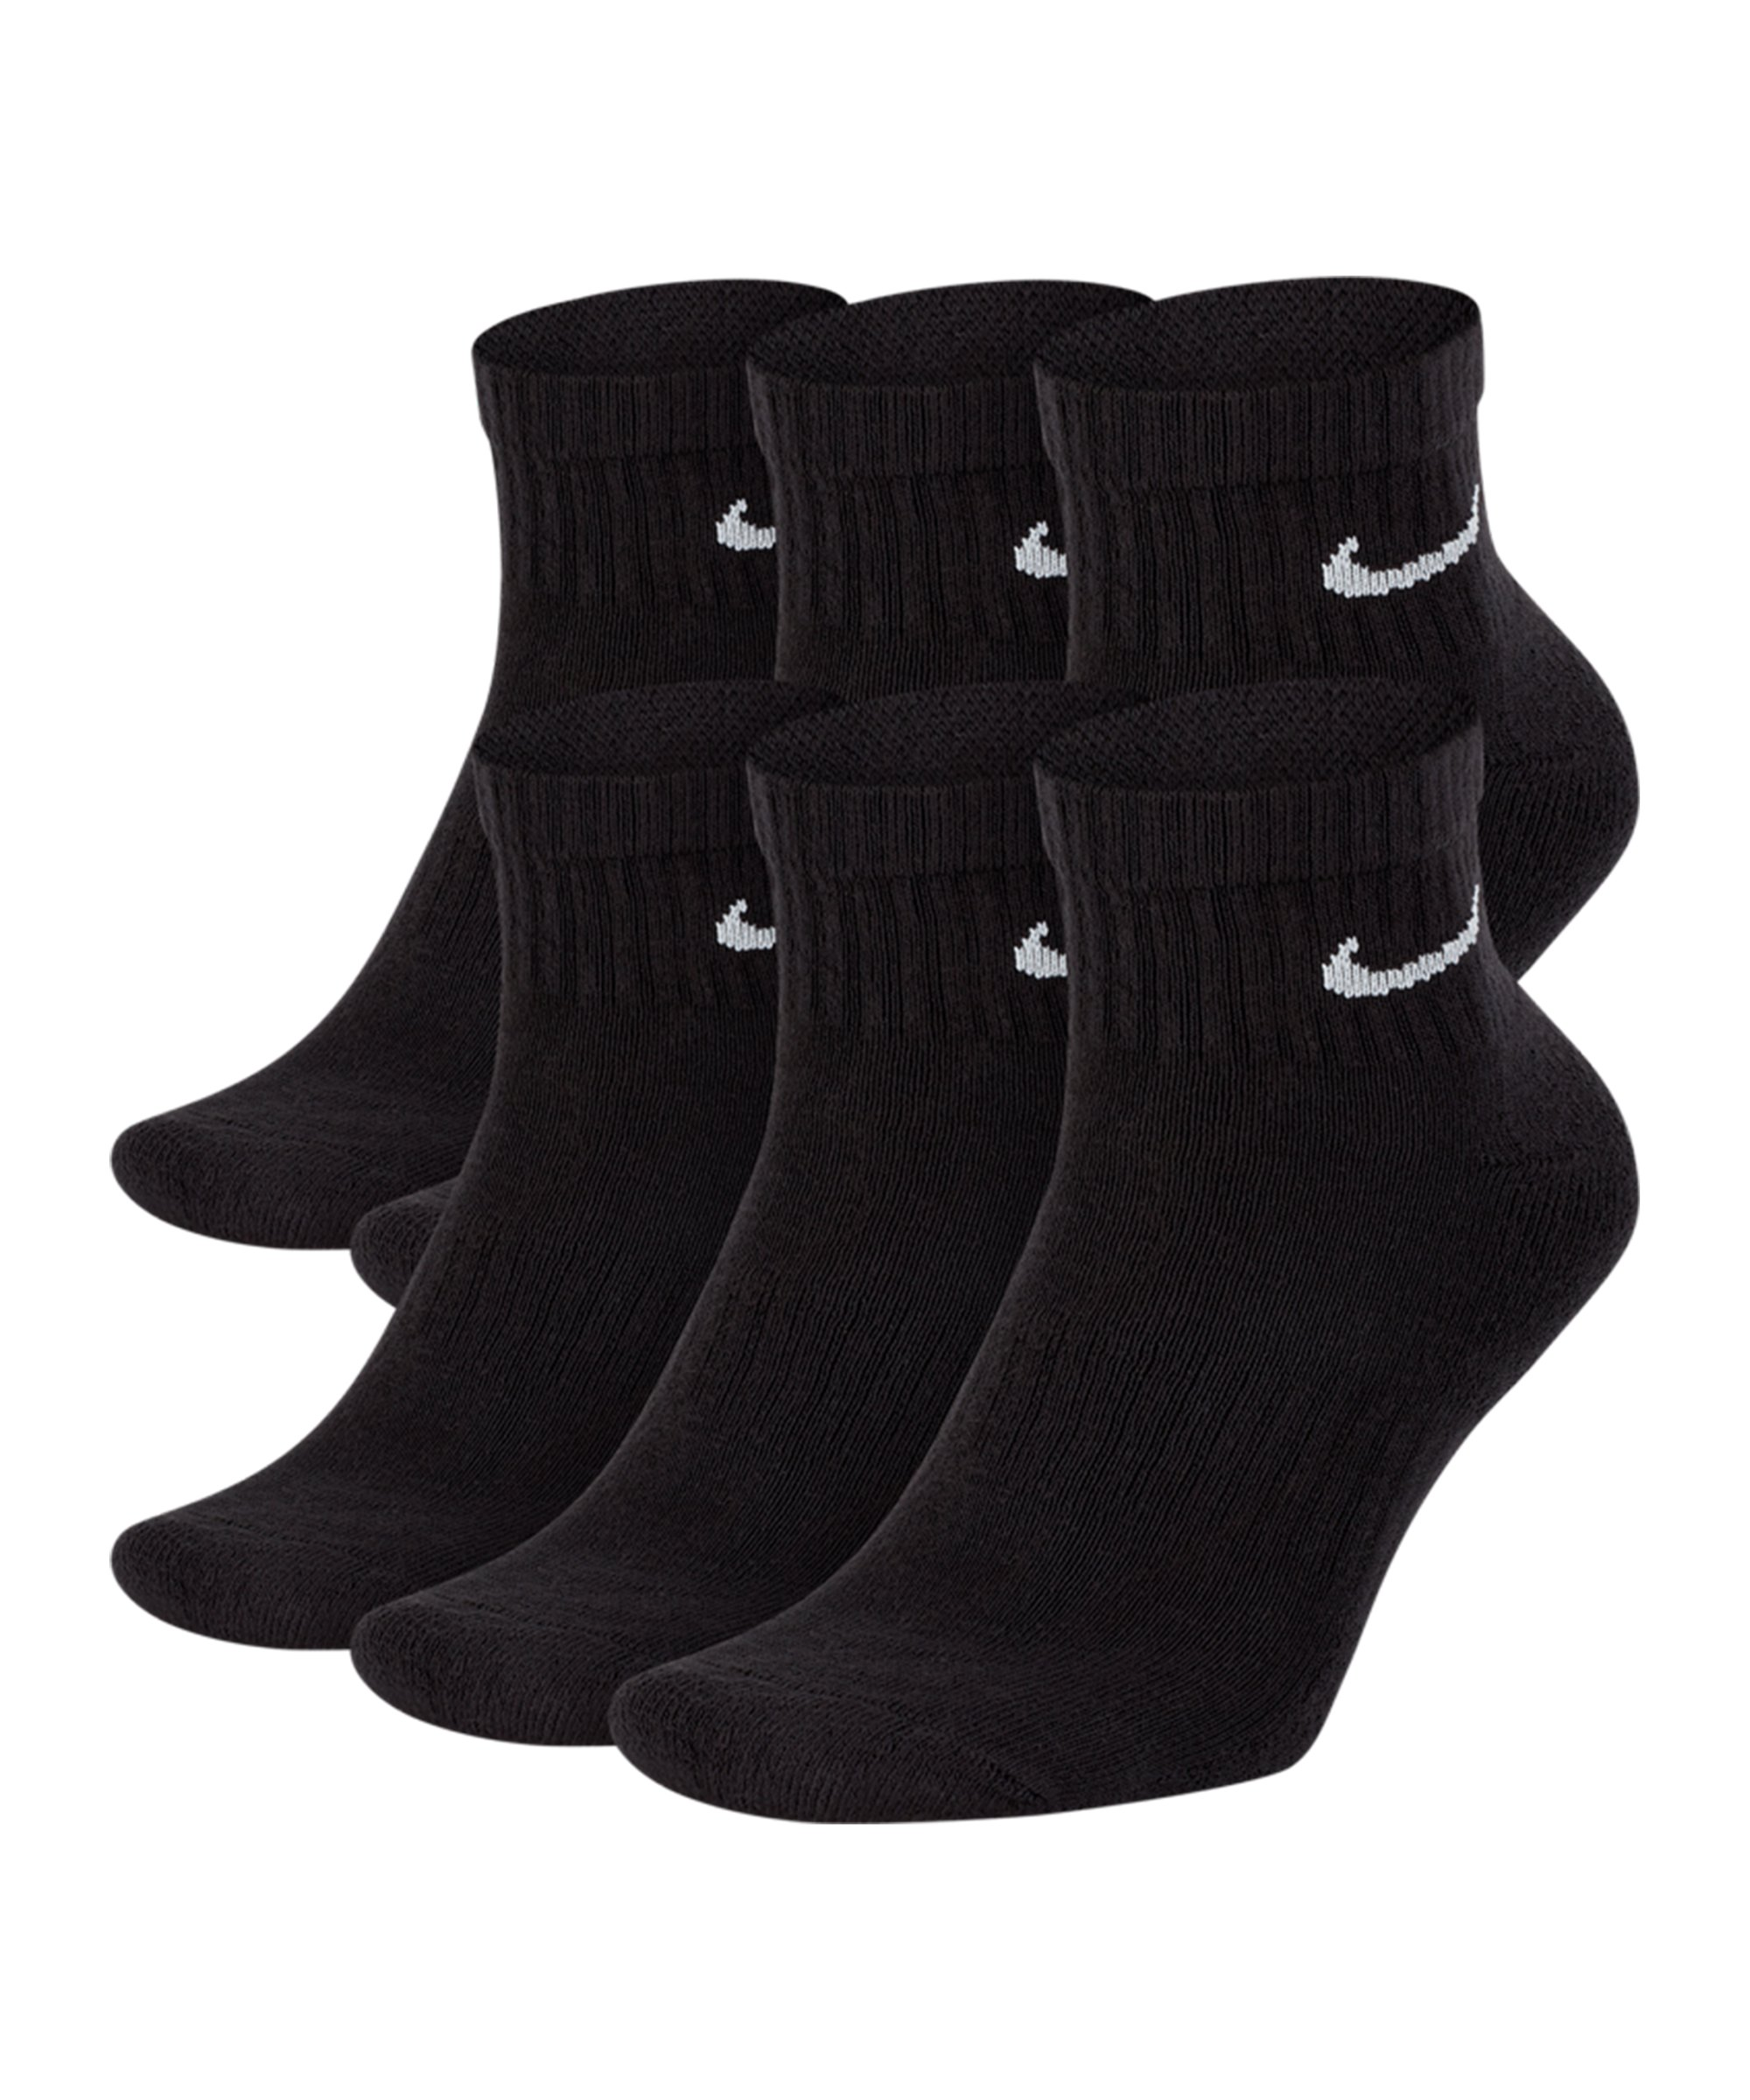 Nike Everyday Cushioned Ankle 6er Pack Socken F010 - schwarz